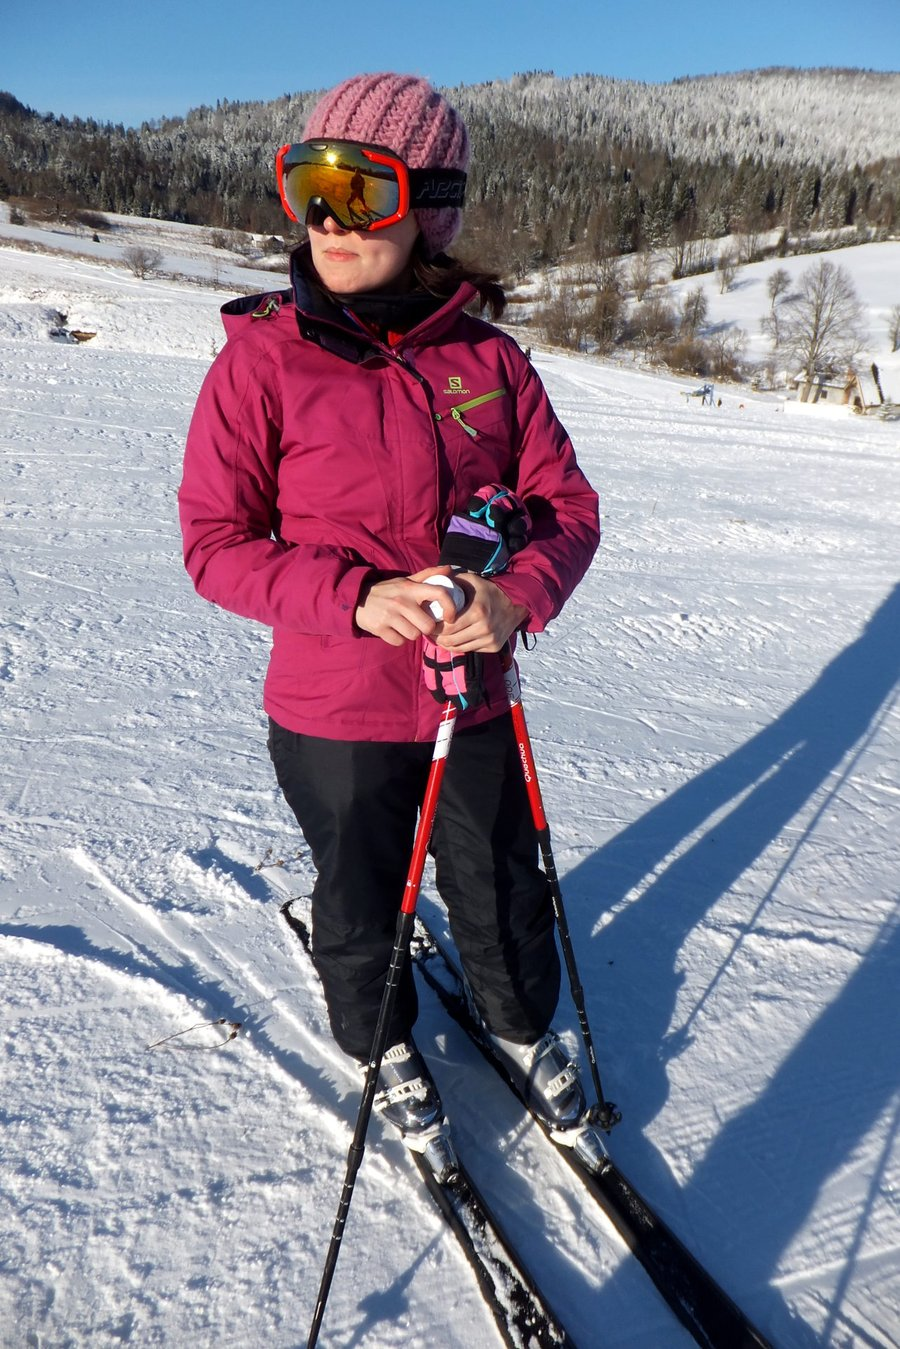 Salomon Jacket - Women's Minim Jam GORE-TEX Jacket